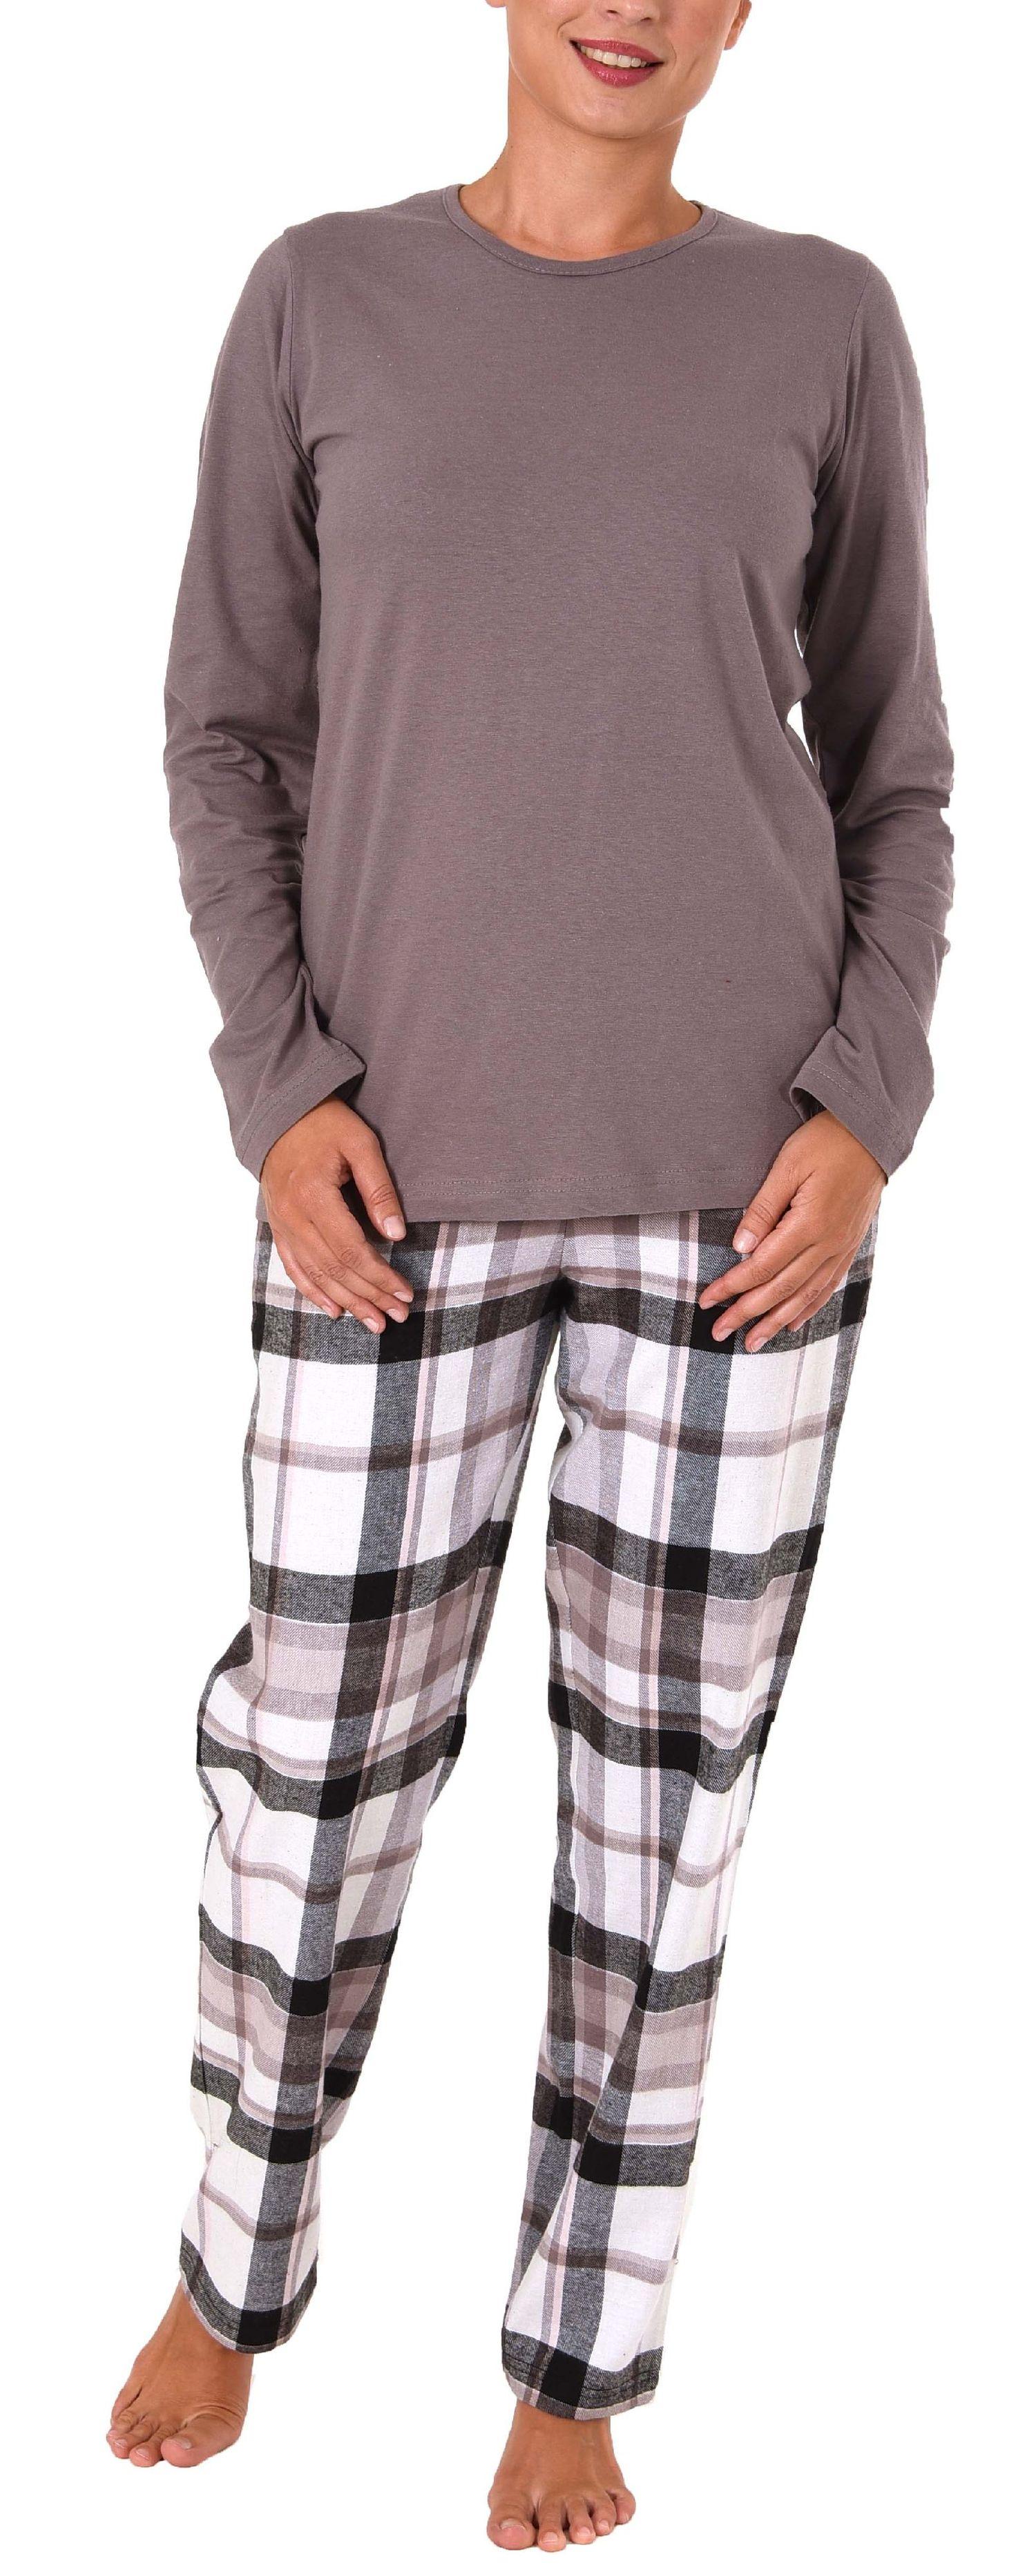 Damen Flanell Pyjama Mix & Match Hose Flanell, Top Single Jersey - auch in Übergrössen – Bild 2